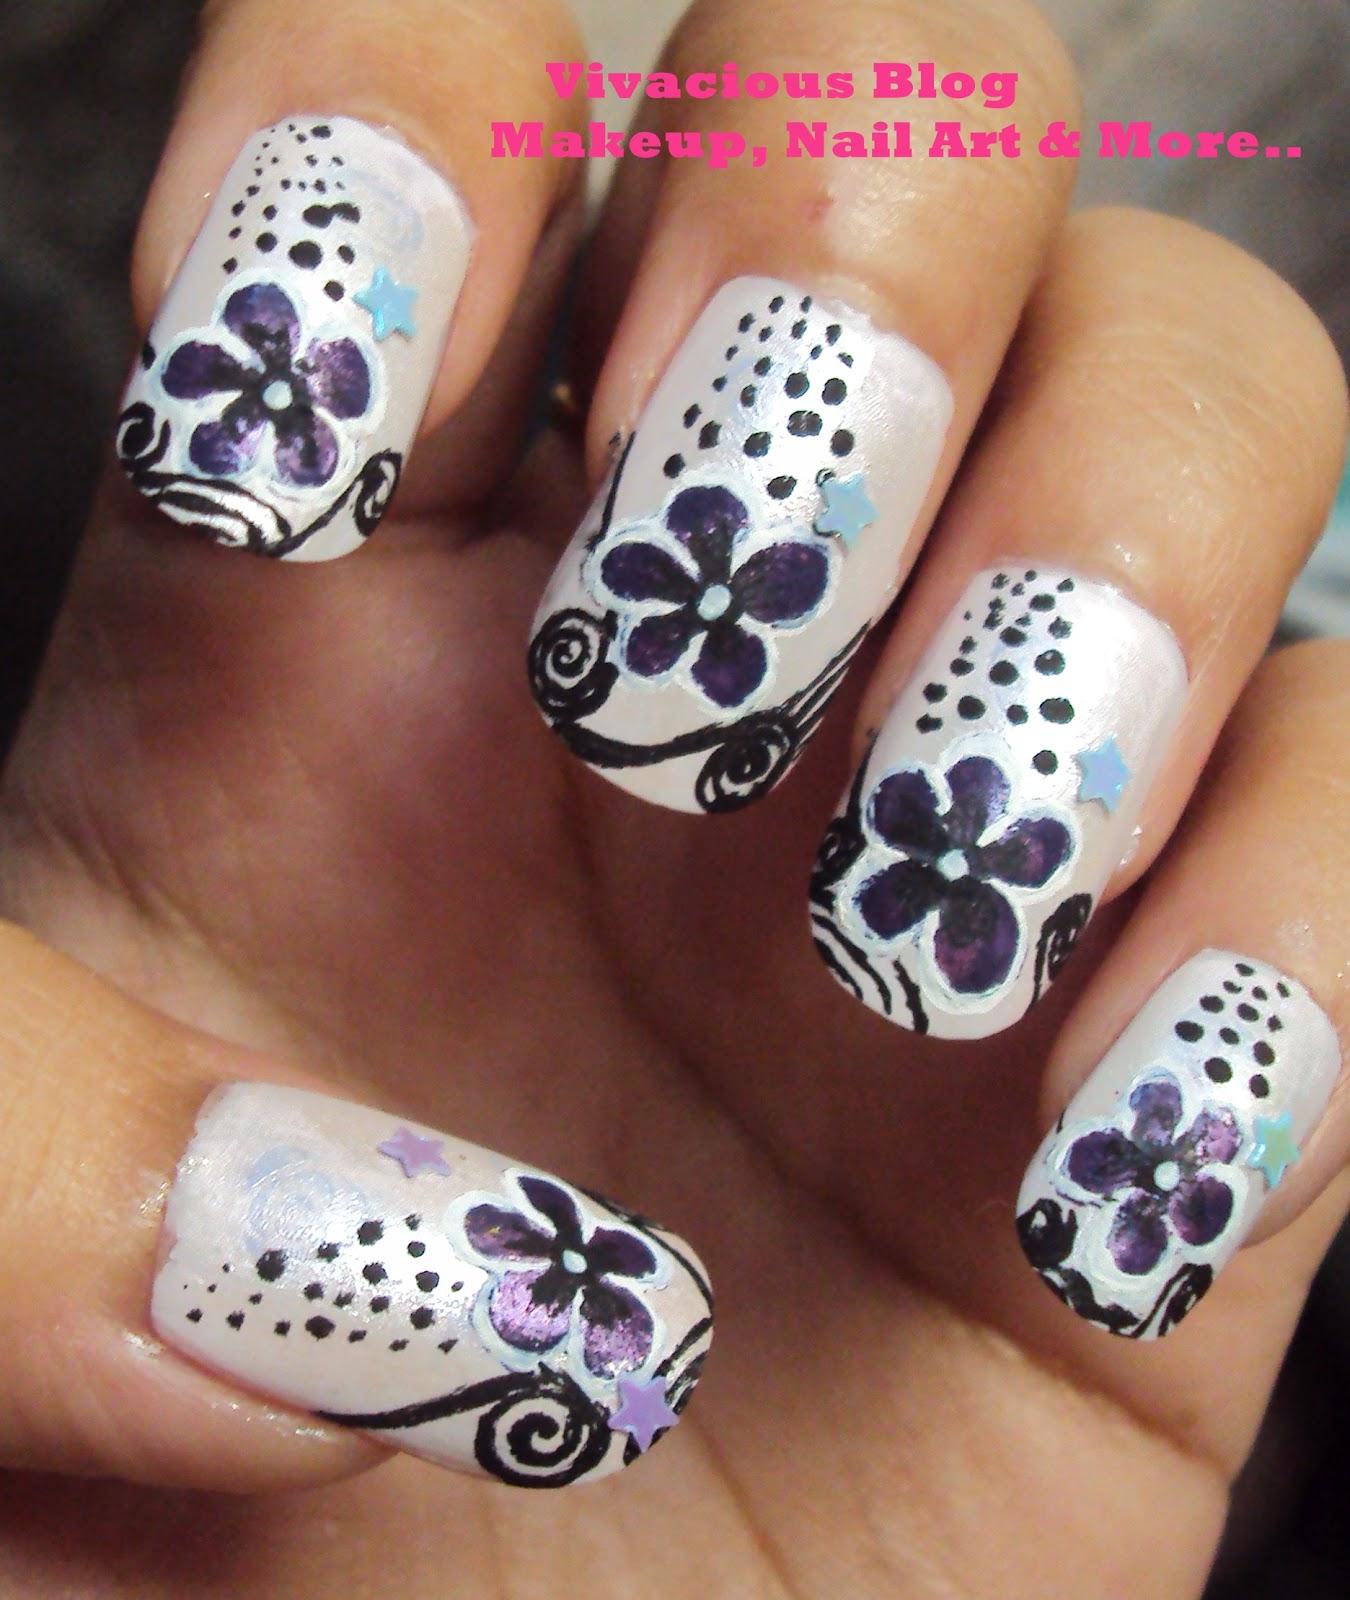 Flower Nail Art: Vivacious Blog: Purple Pink Flower Nail Art